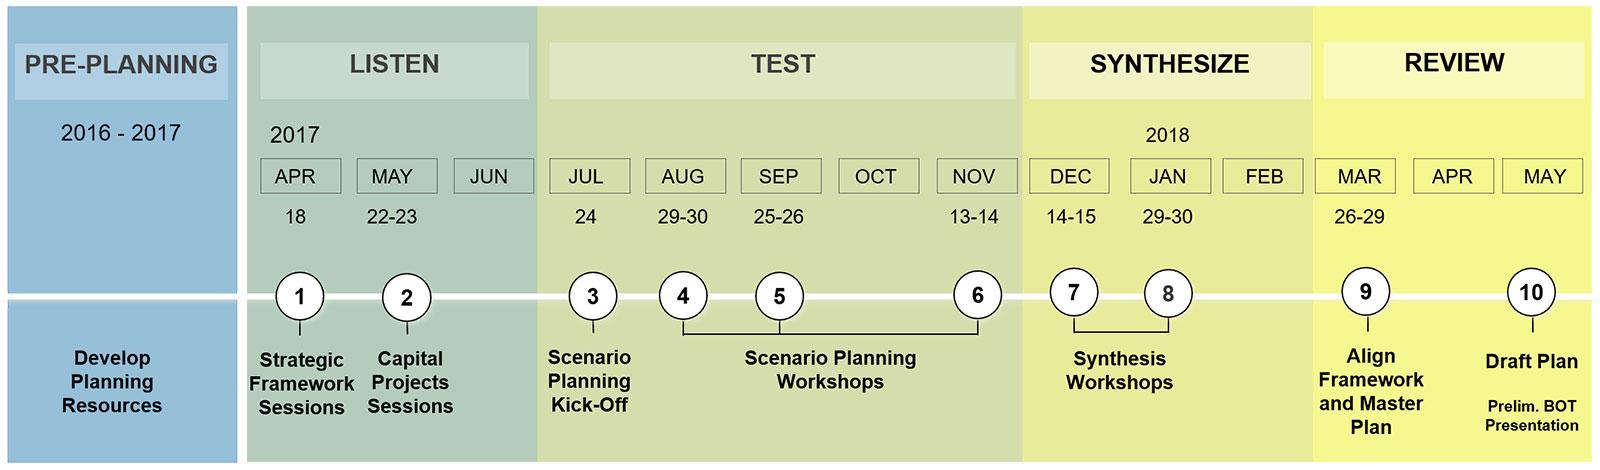 Campus Master Plan process timeline